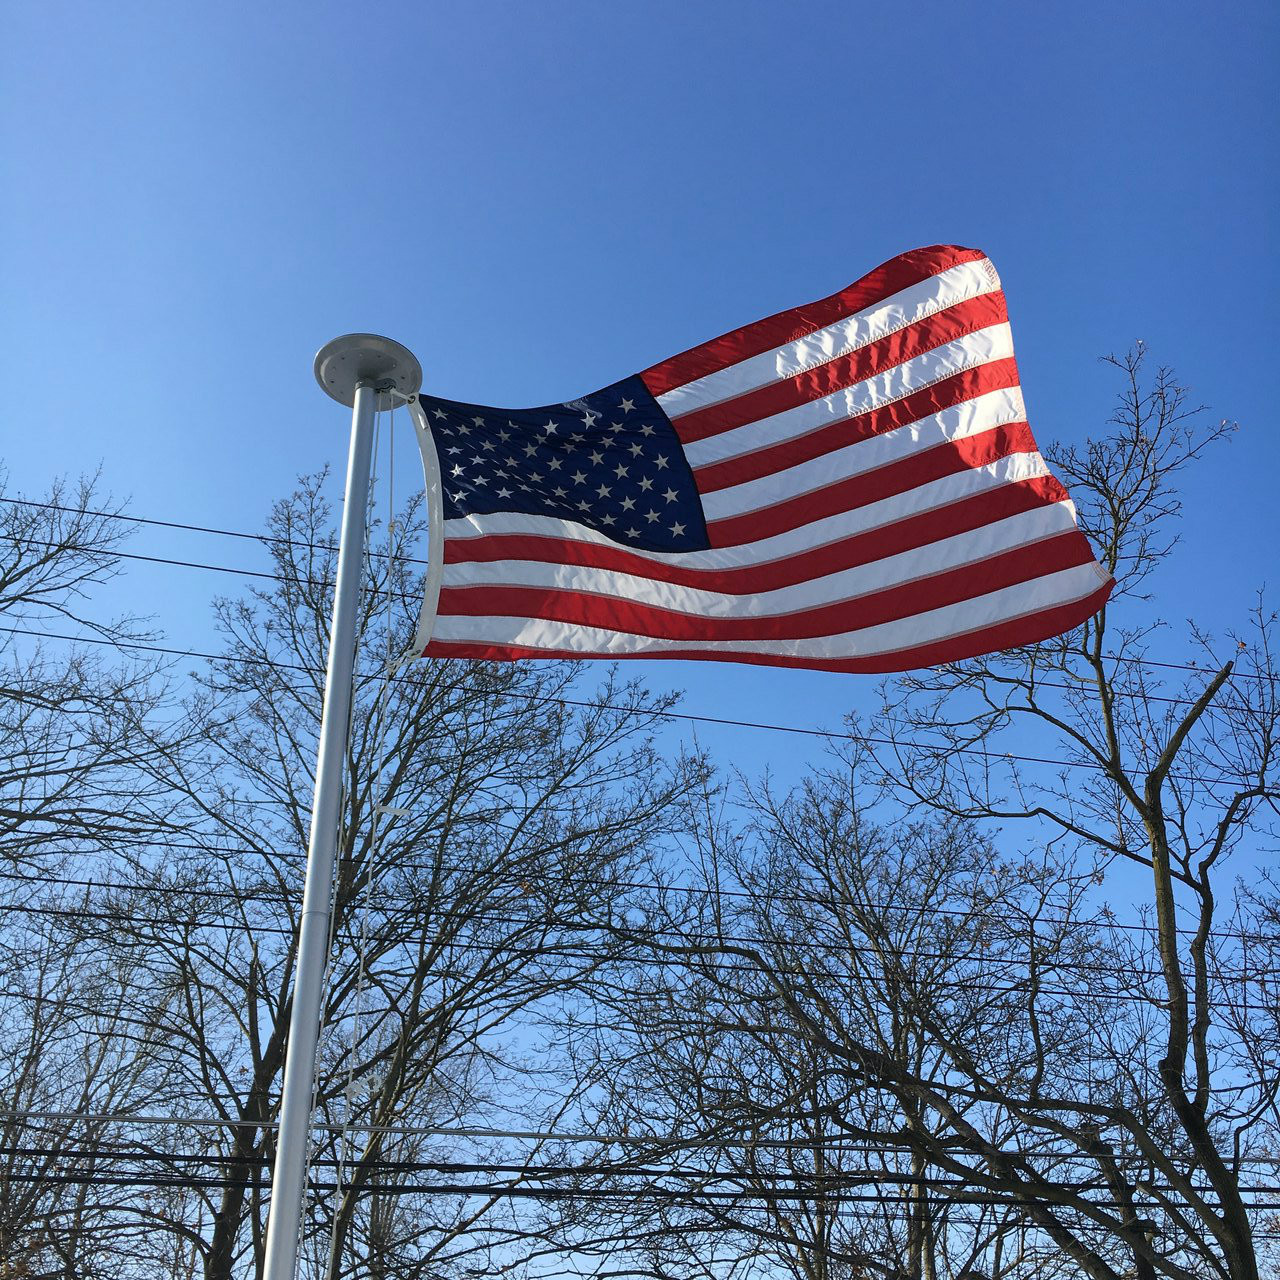 endura nylon u.s. flag 100% made in u.s.a.eder flag